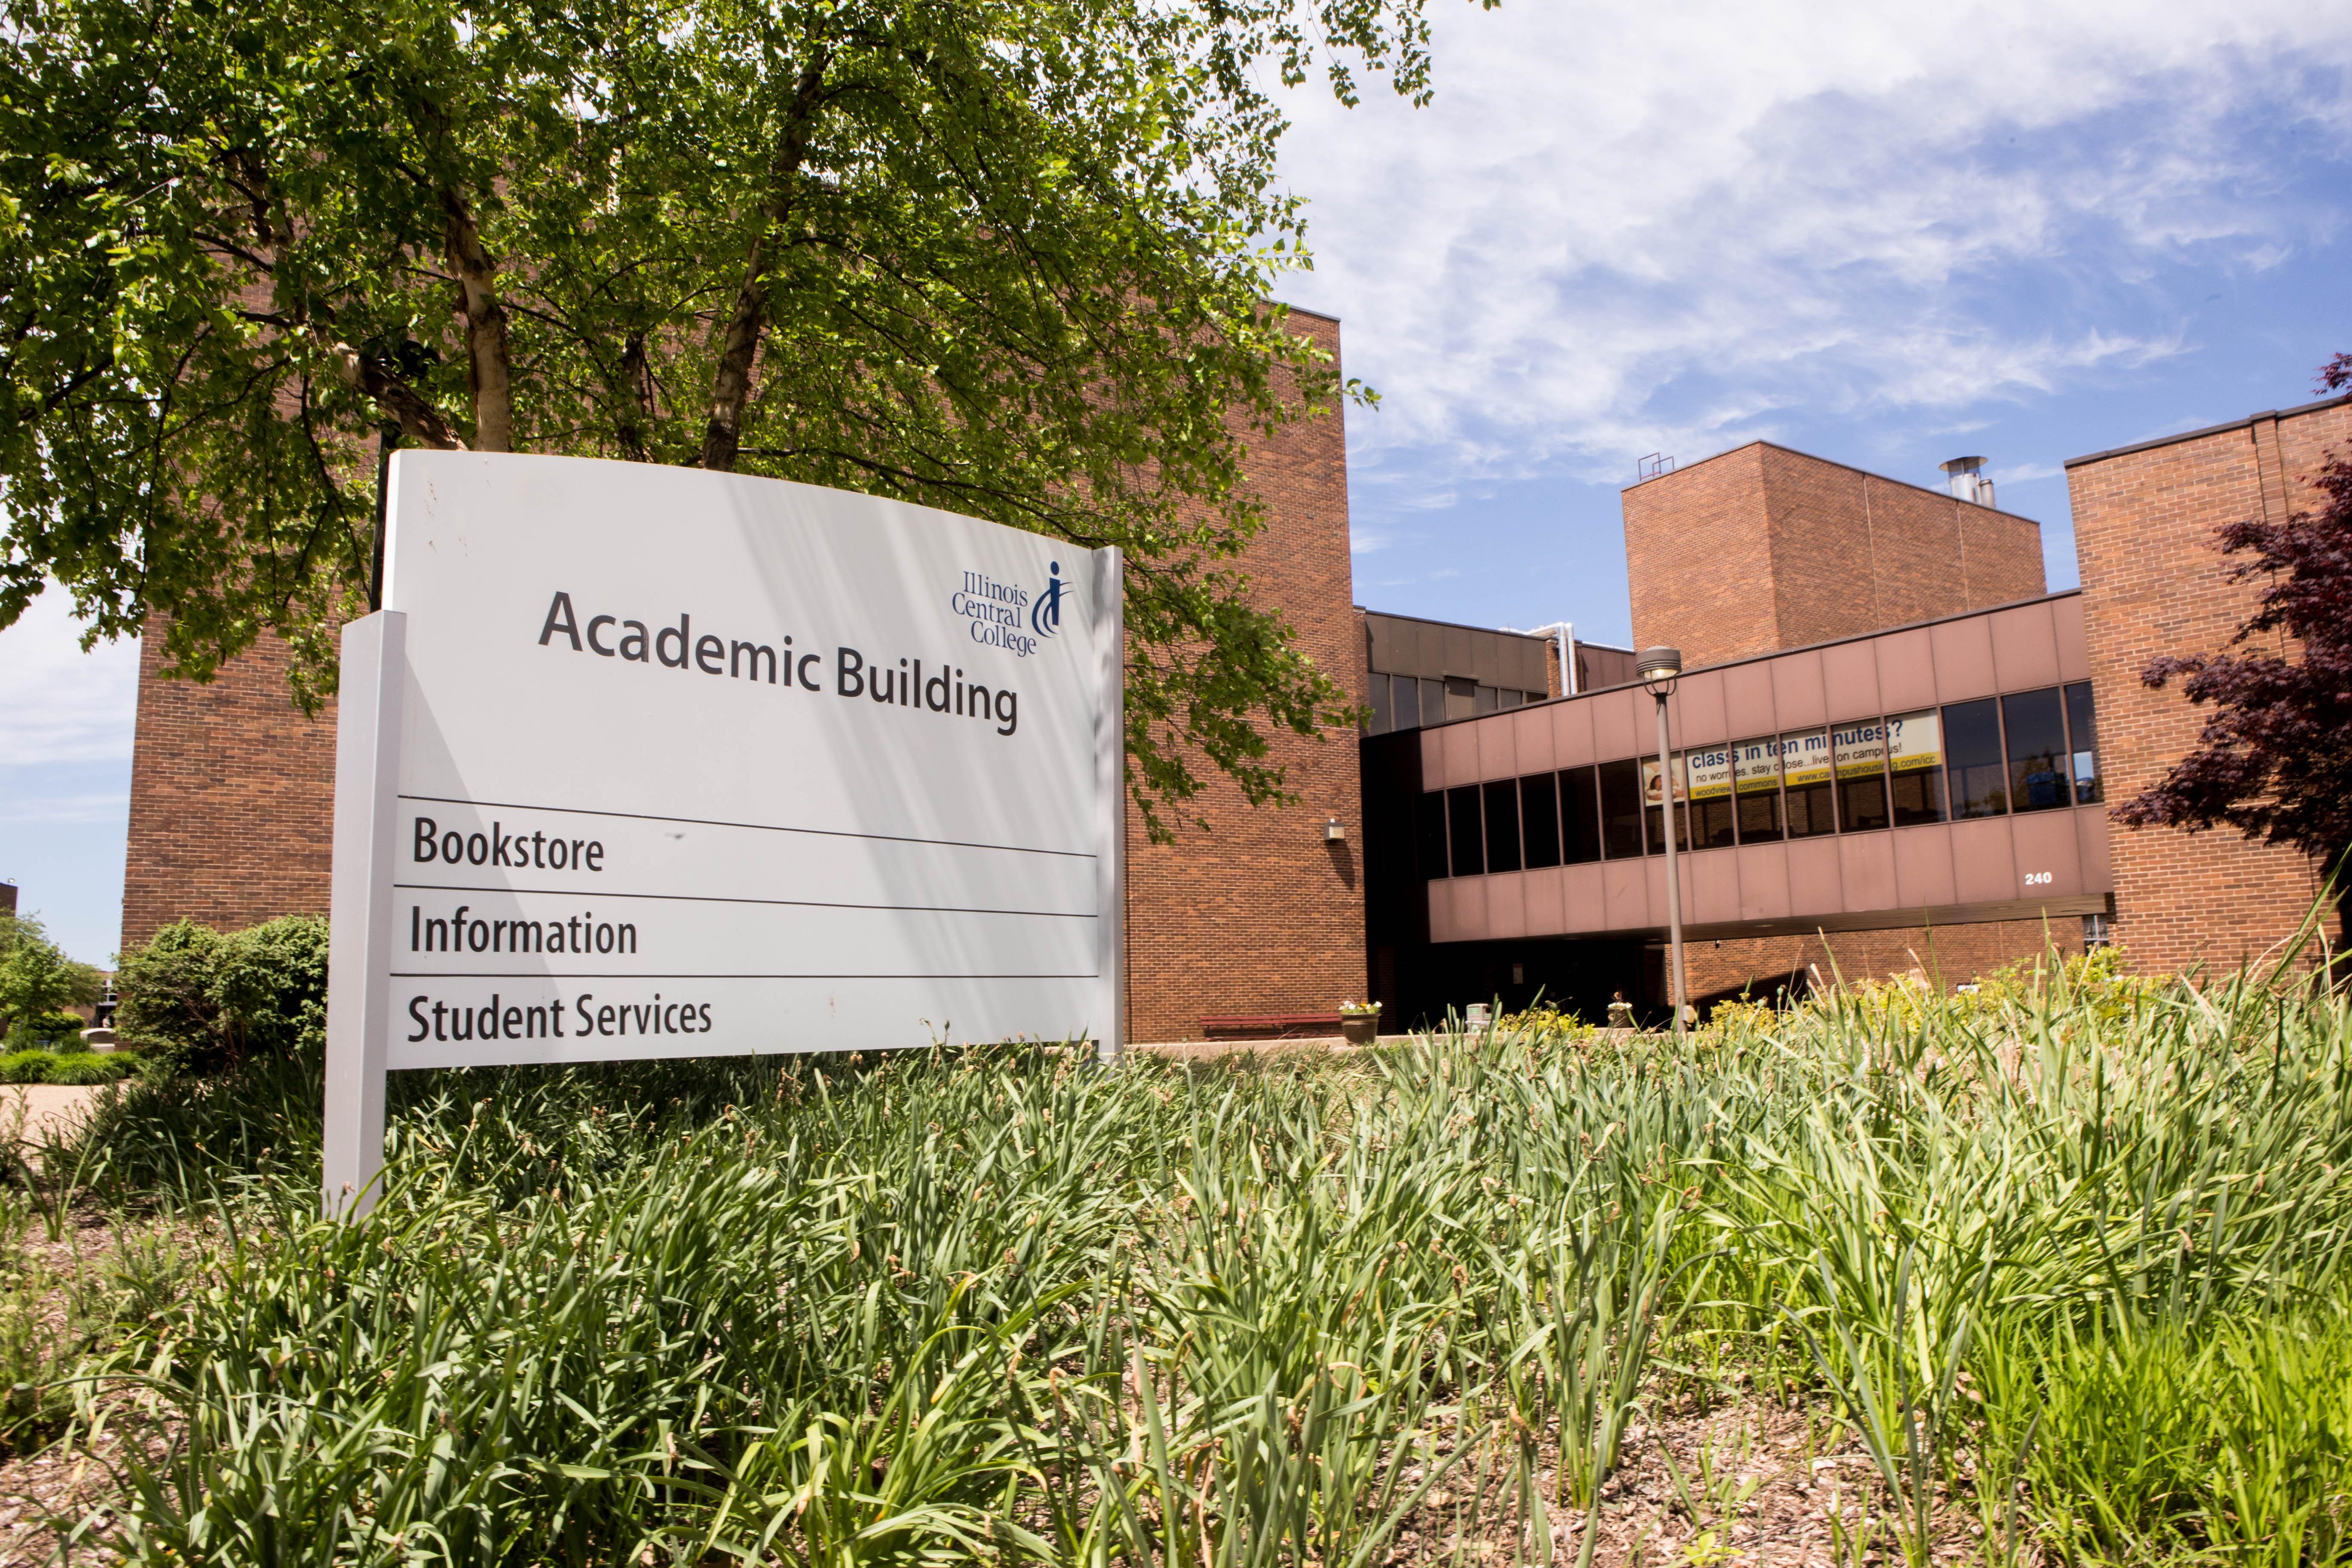 Achademic Building